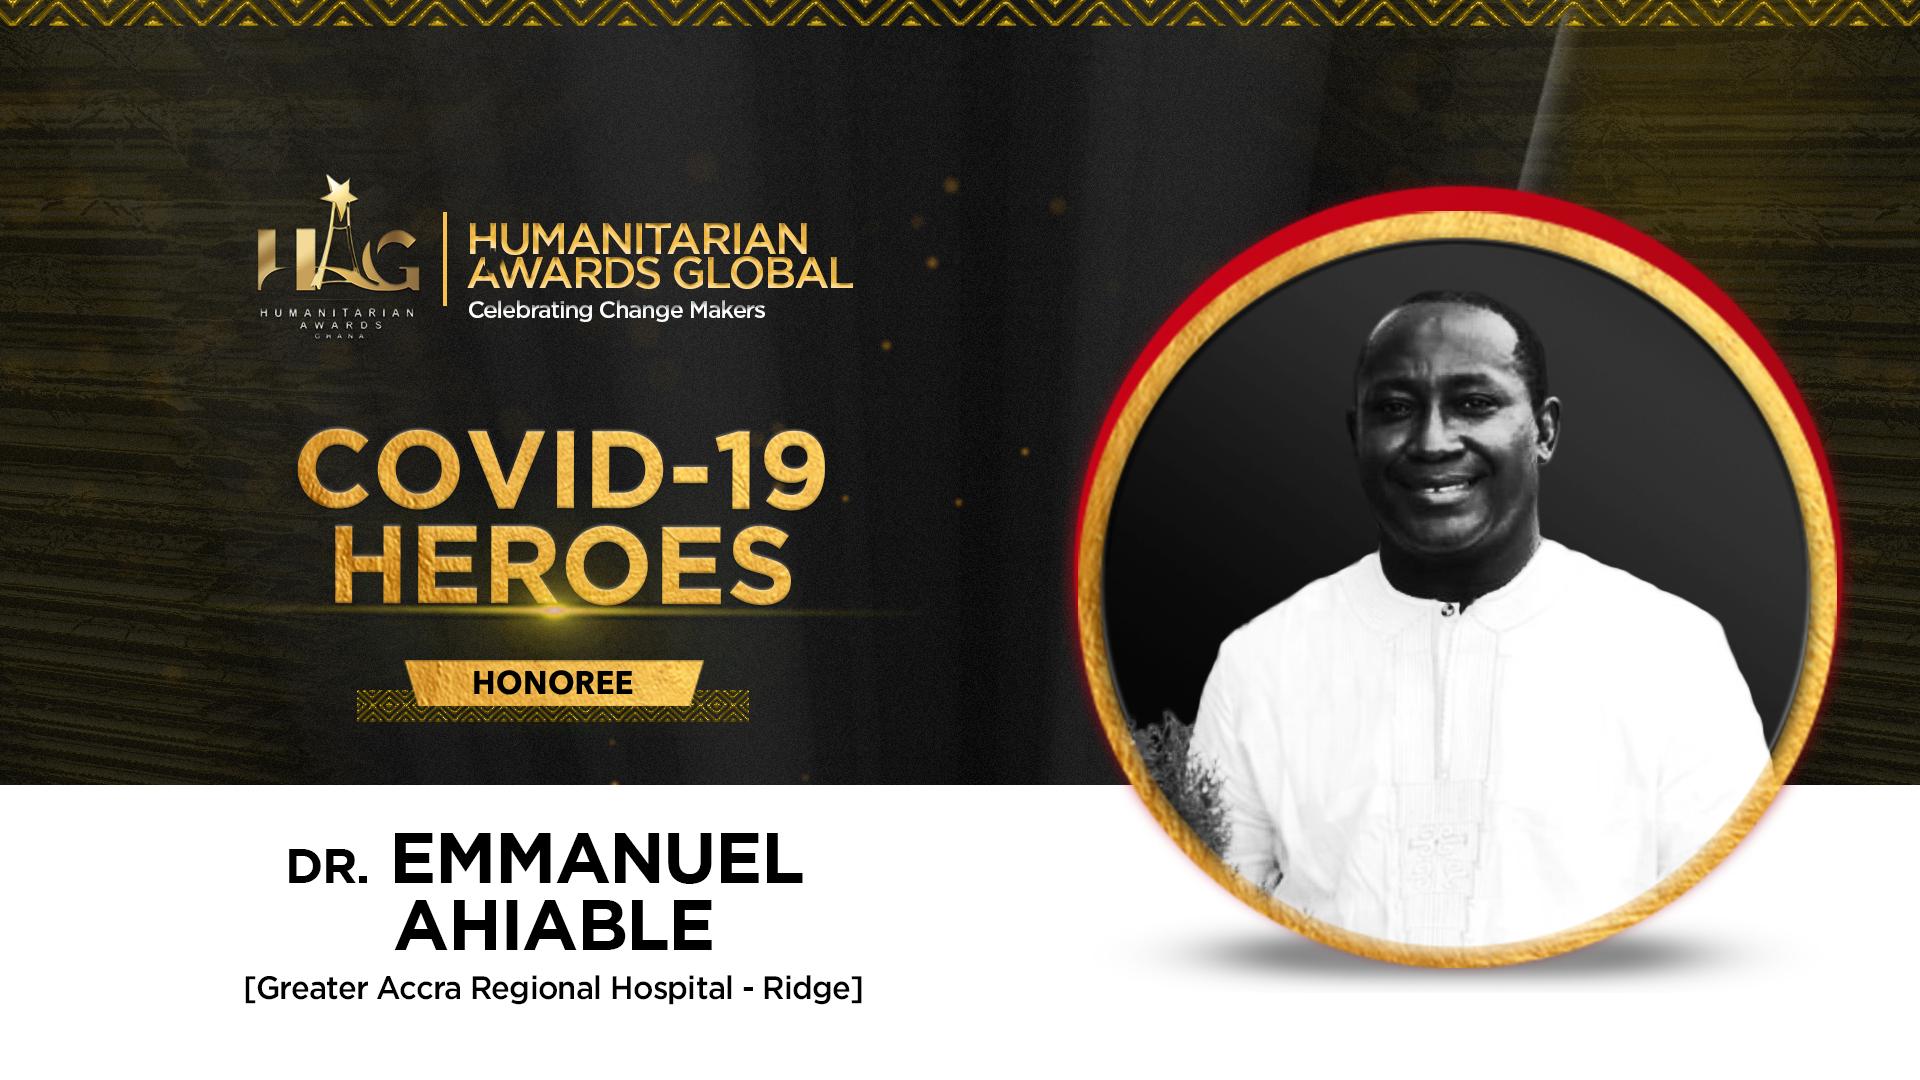 Dr. Emmanuel Kwadzo Ahiable of Ridge Hospital to be honoured by Humanitarian Awards Global